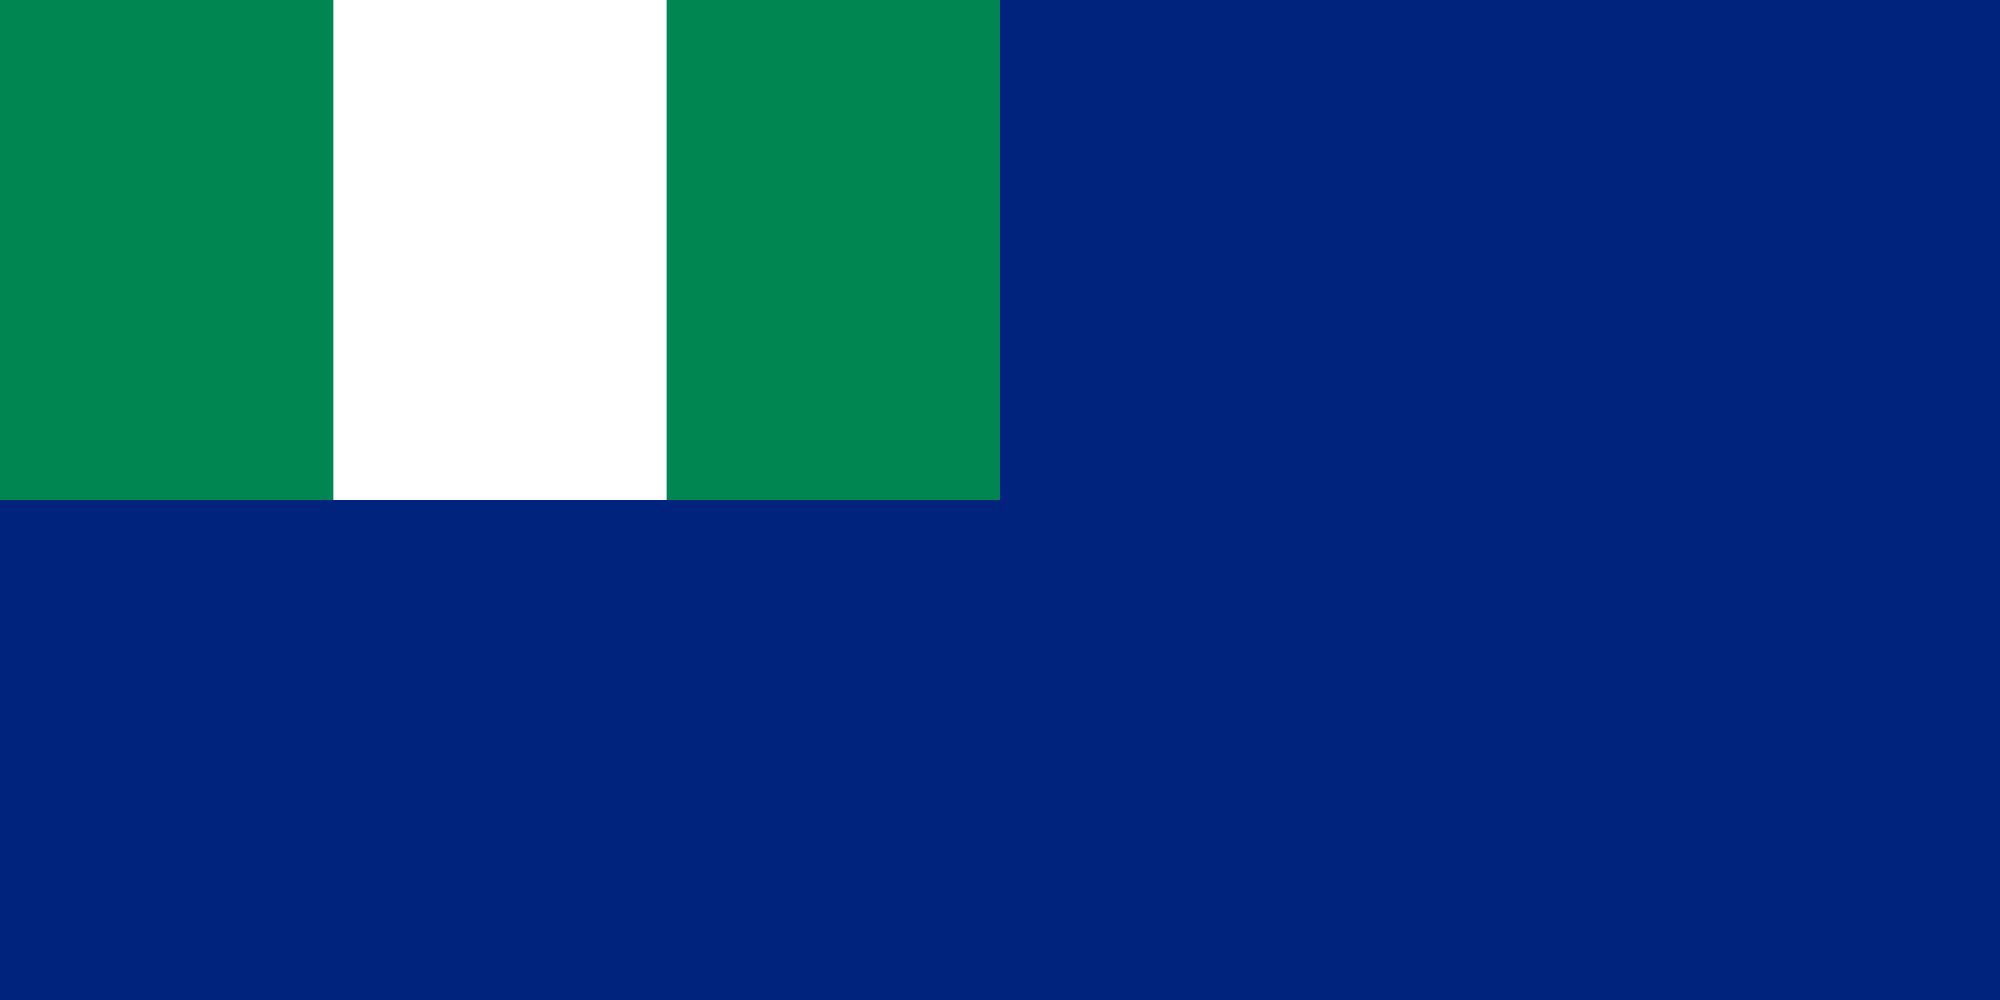 Nigeria (State ensign)